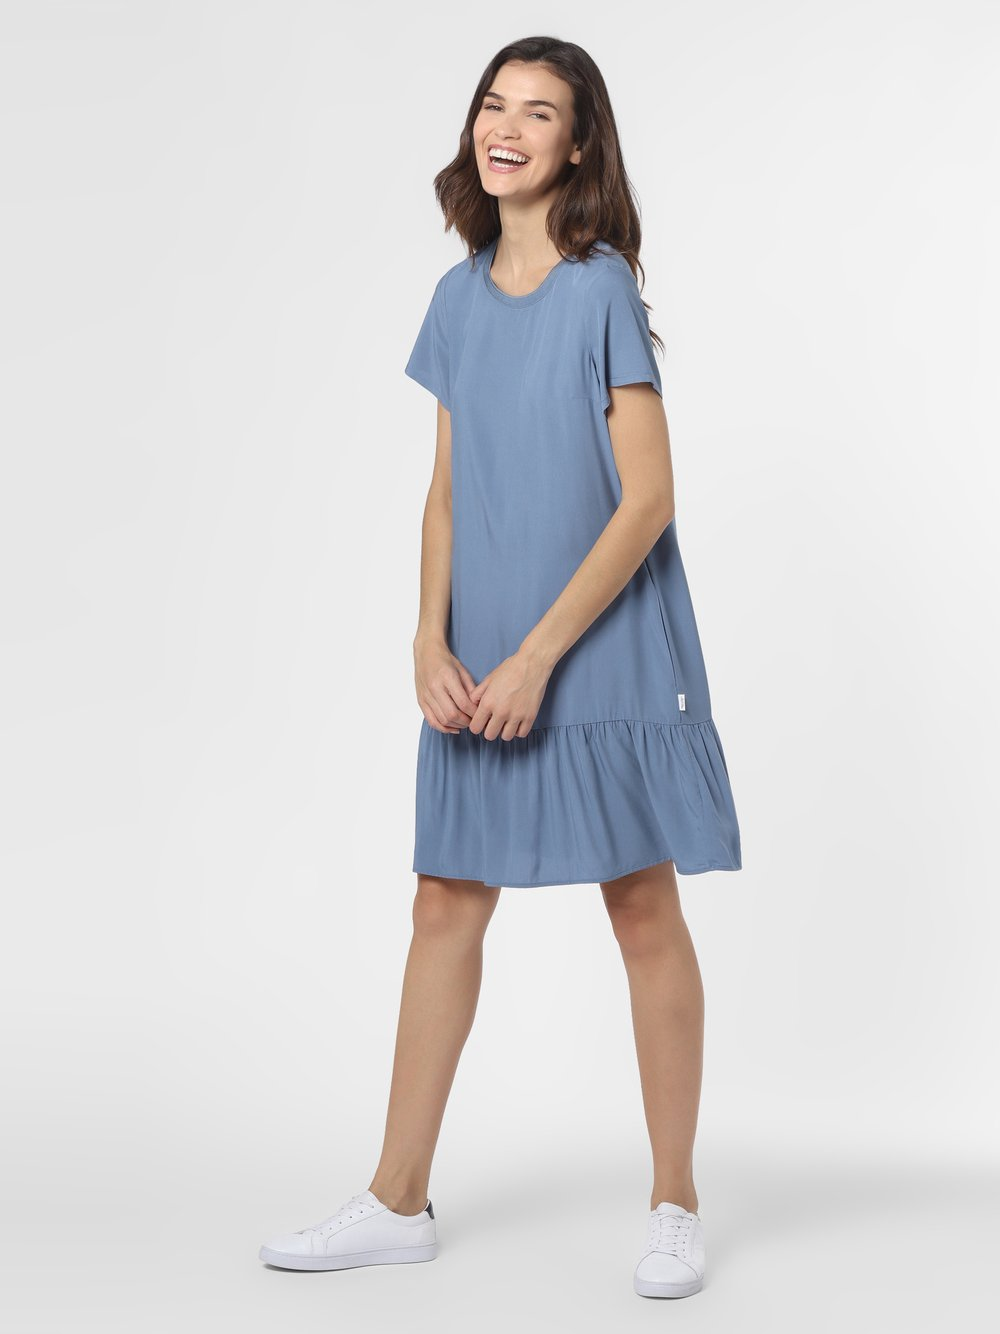 Marc O'Polo Denim – Sukienka damska, niebieski Van Graaf 474355-0001-09900